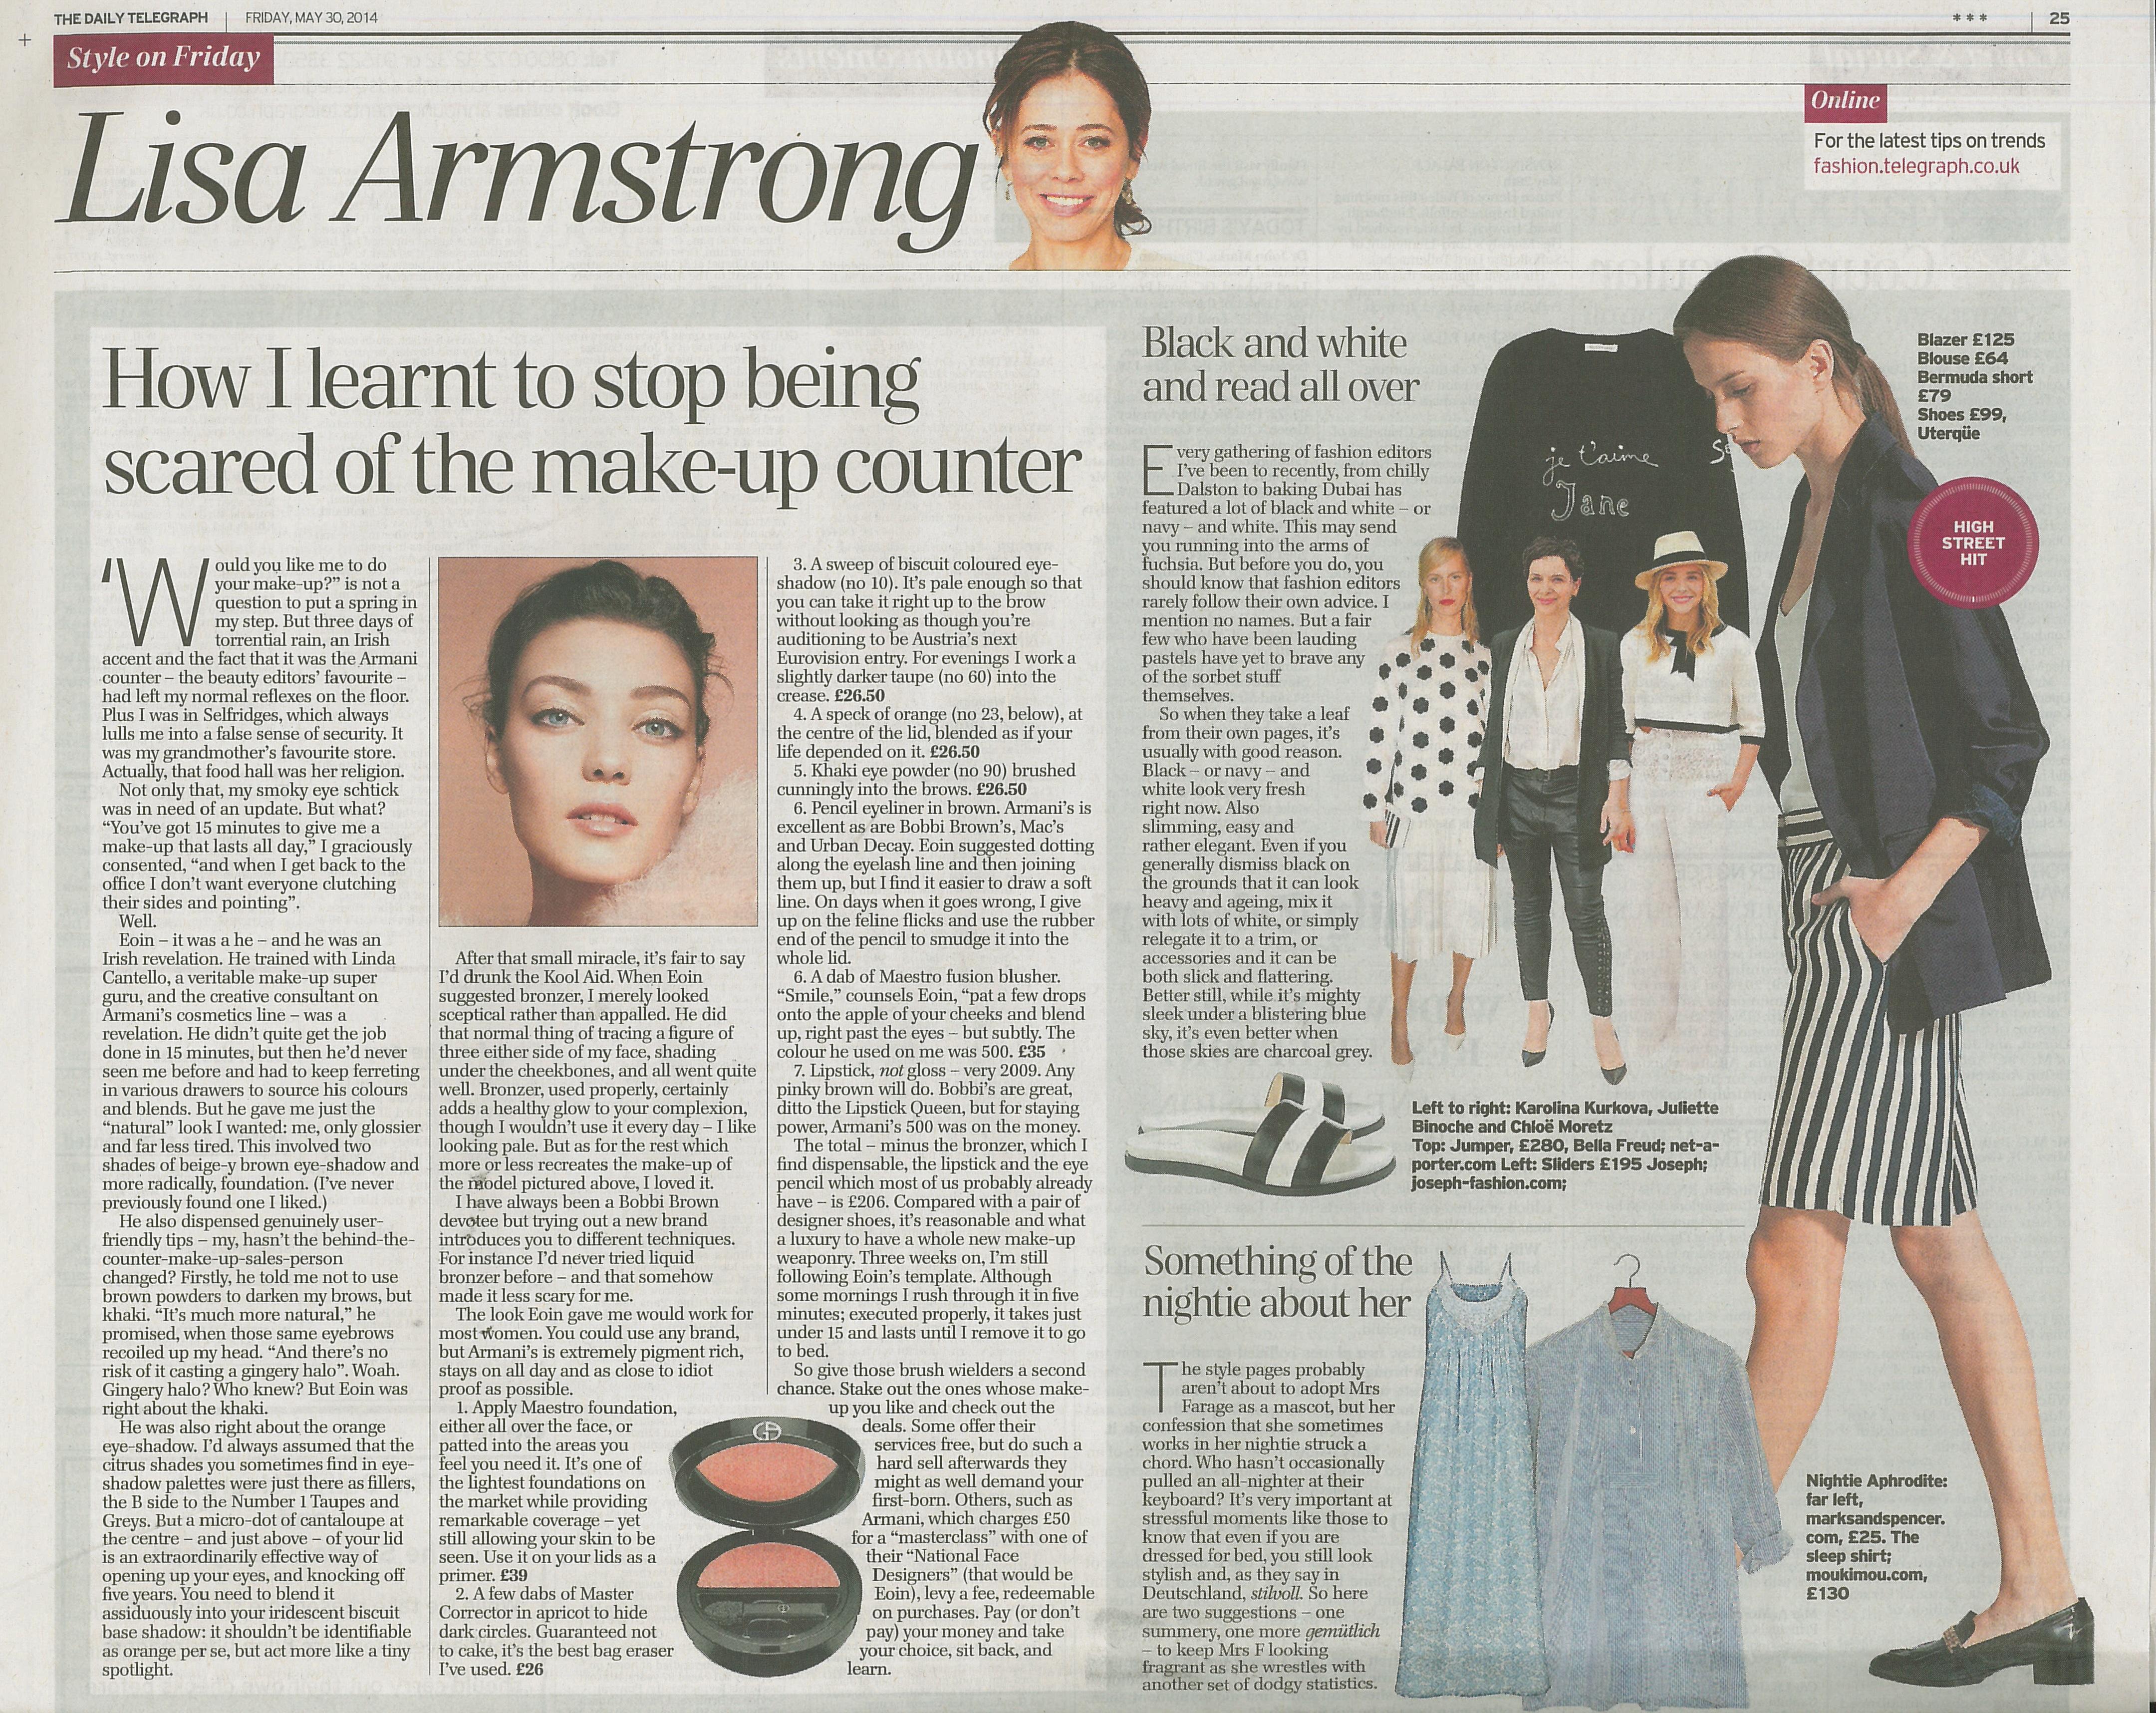 The daily telegraph fashion